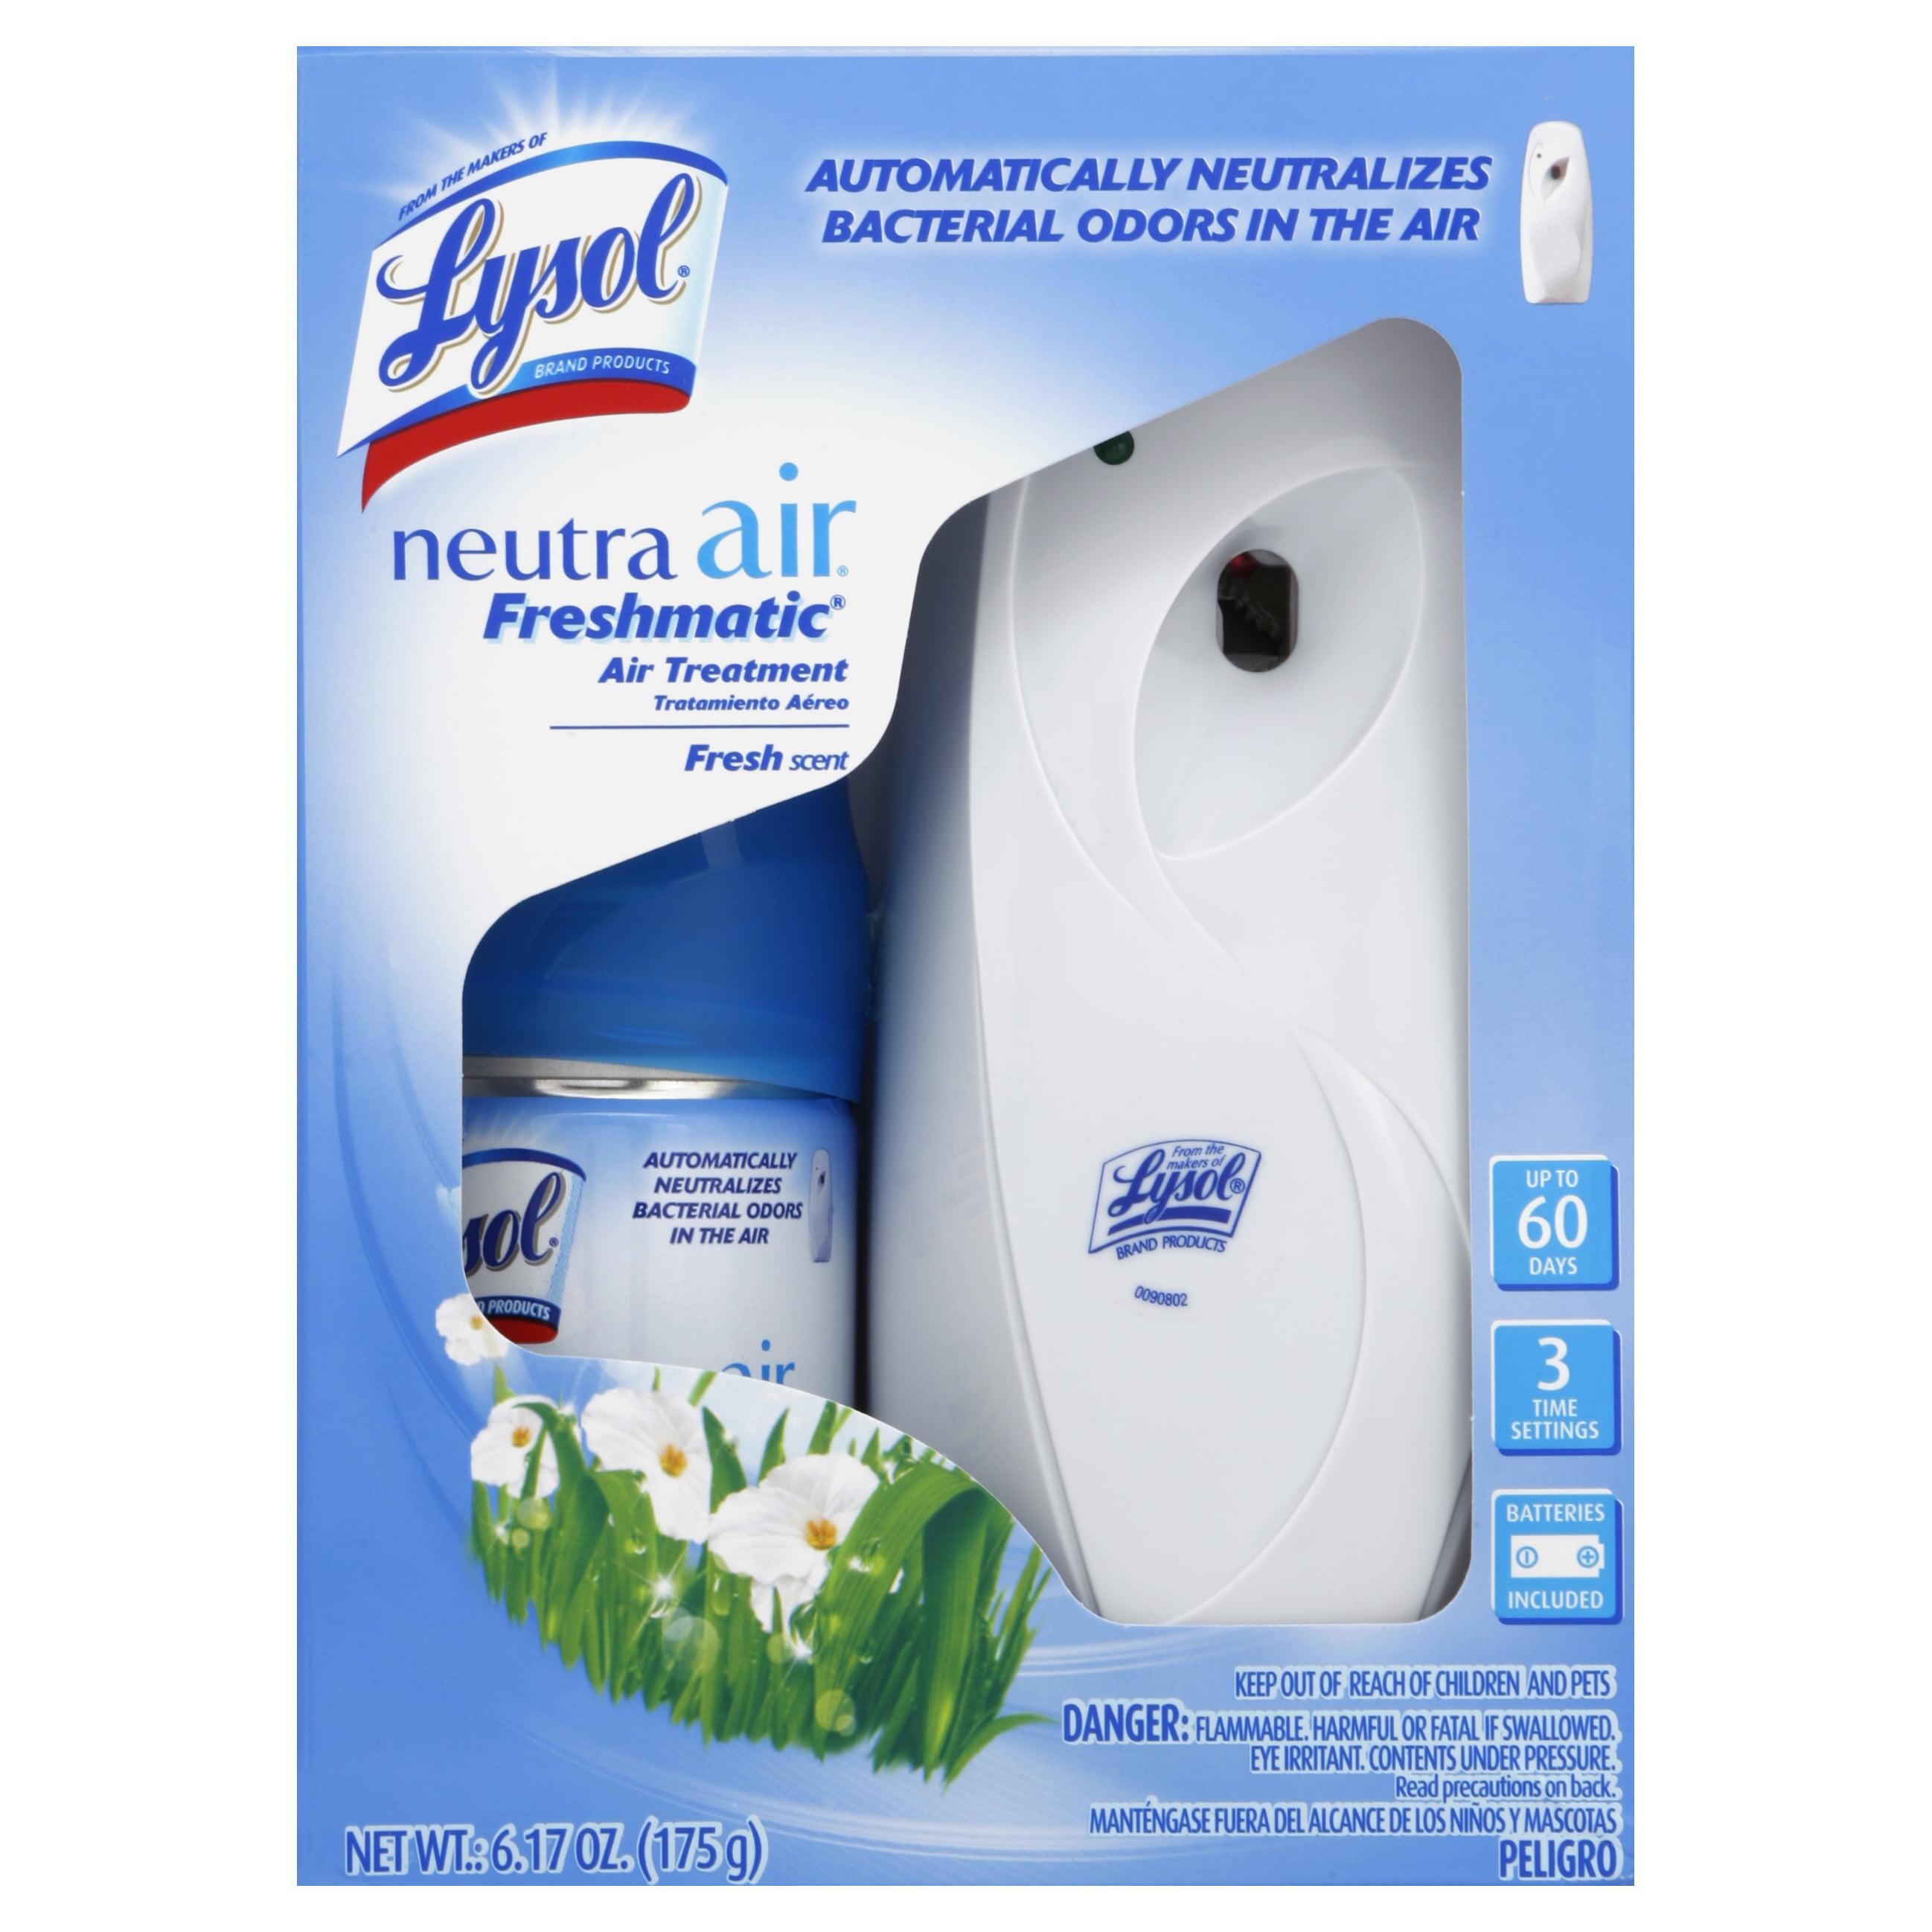 Lysol Neutra Air Freshmatic Automatic Spray Kit (Gadget + 1 Refill) Fresh Scent, Air Freshener, Odor Neutralizer